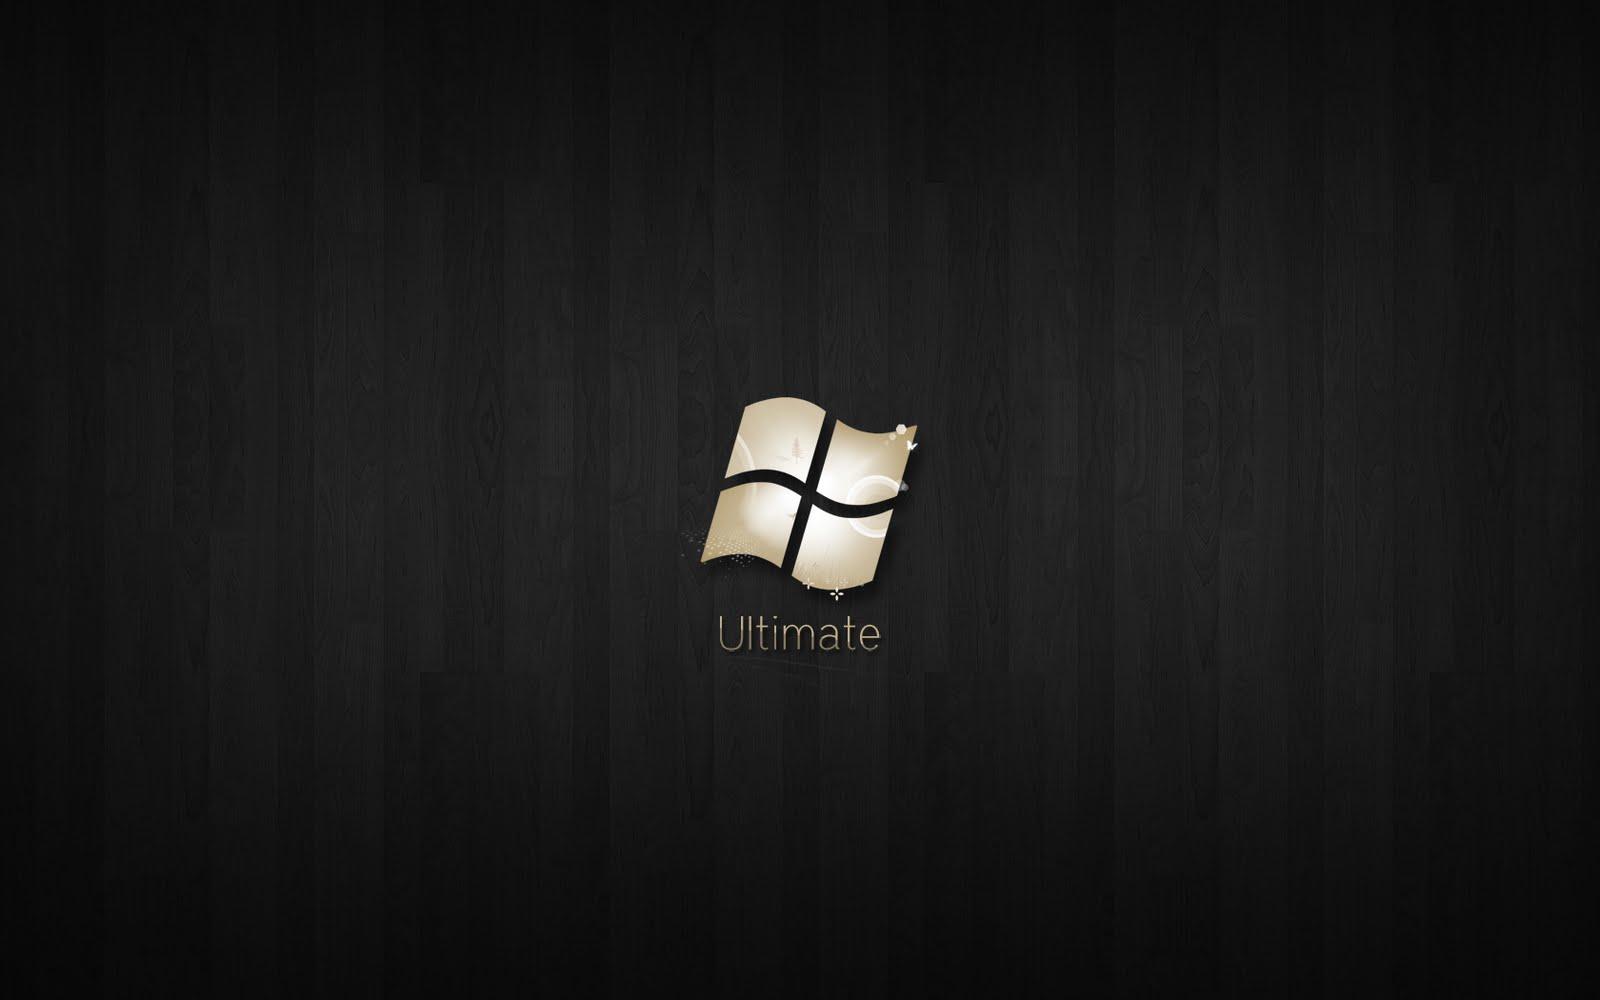 Windows 7 Ultimate Black Edition